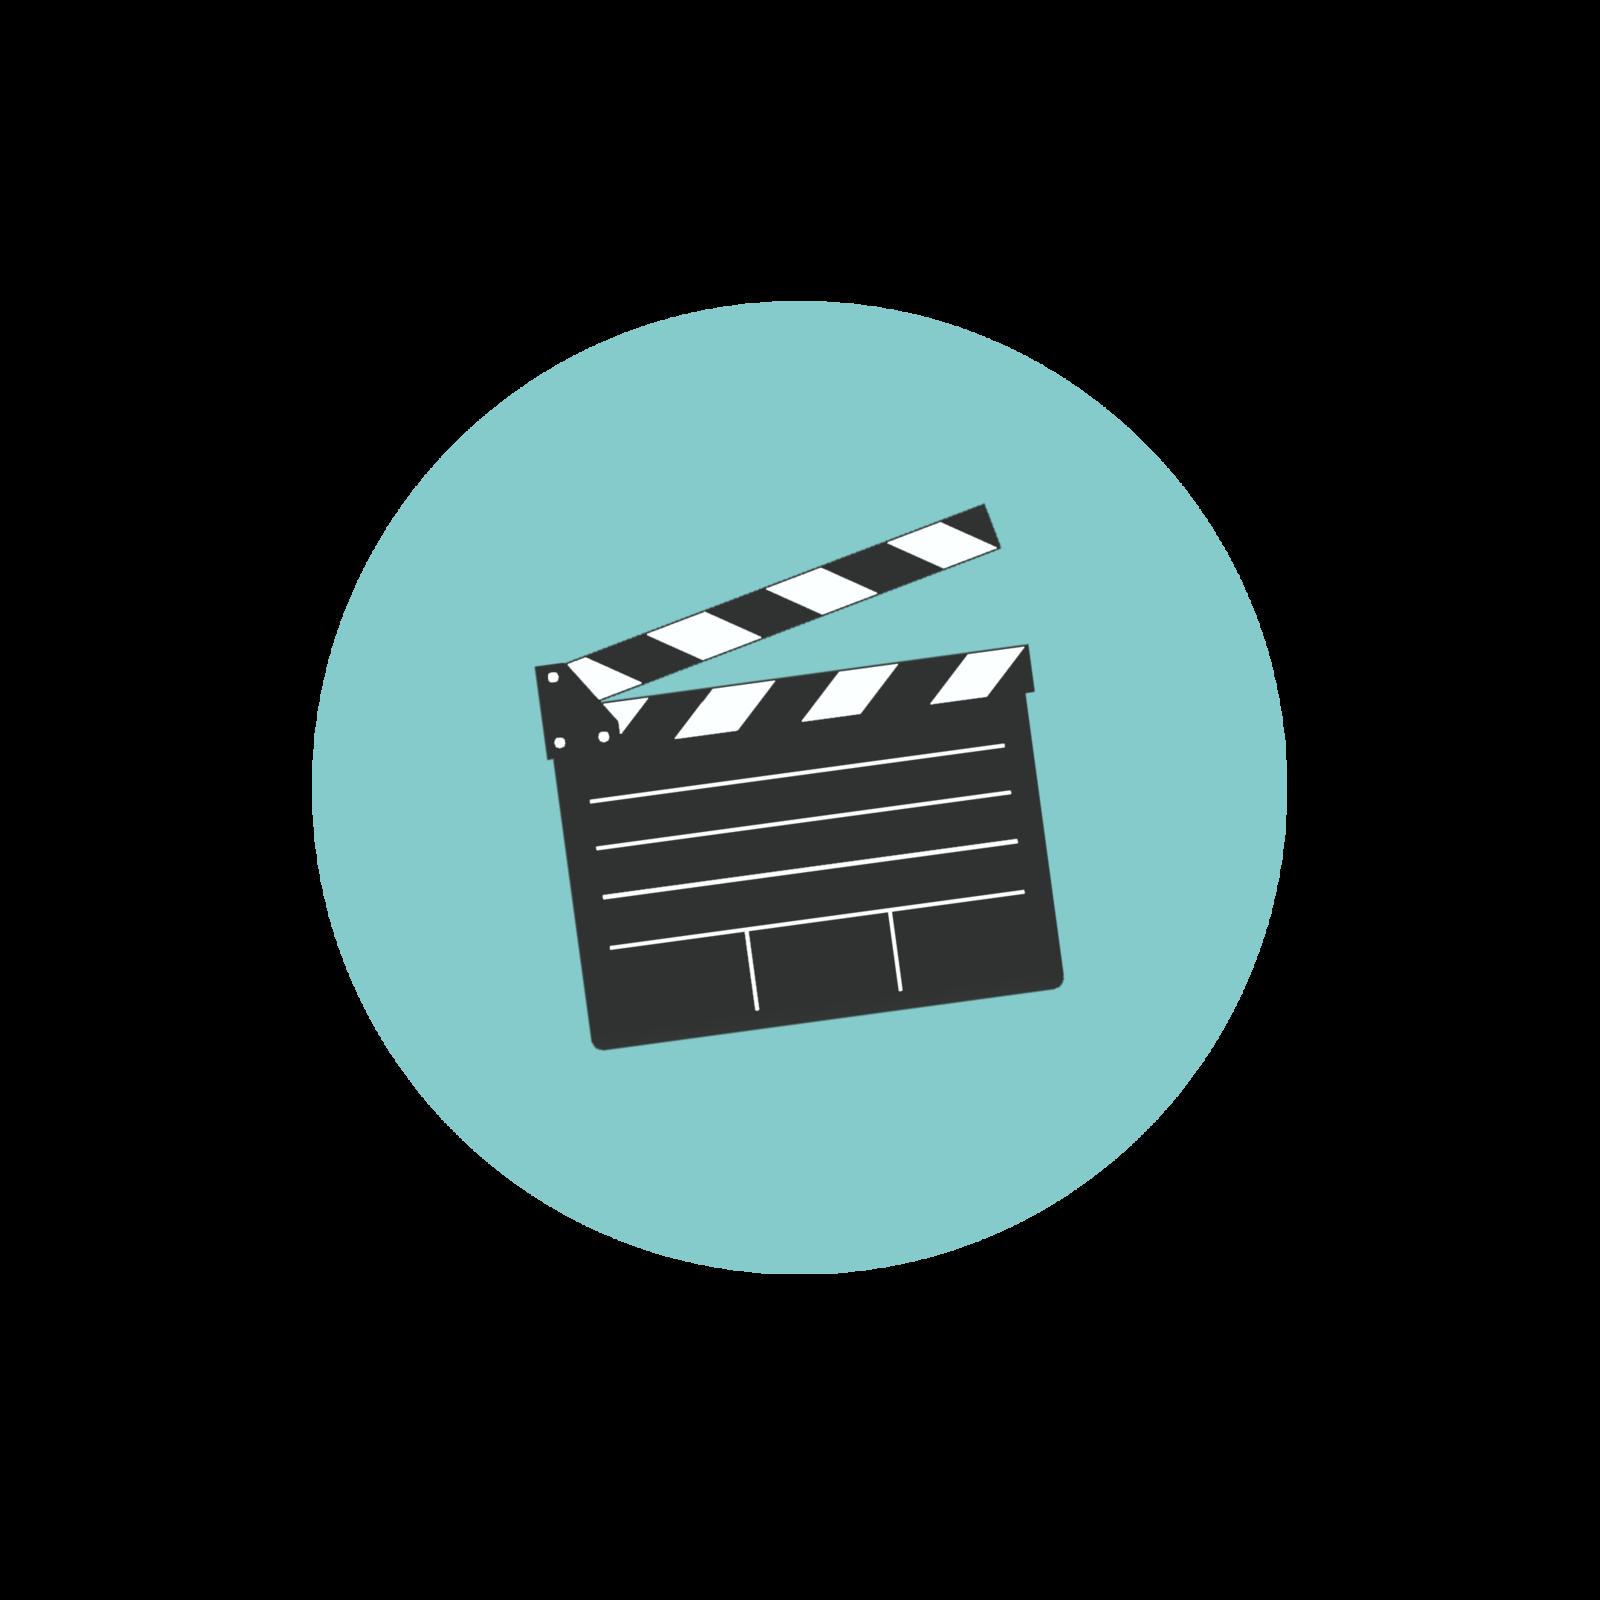 Futur tournage de Tralala, avec Mathieu Amalric, Josiane Balasko, Mélanie Thierry, Maïwenn.